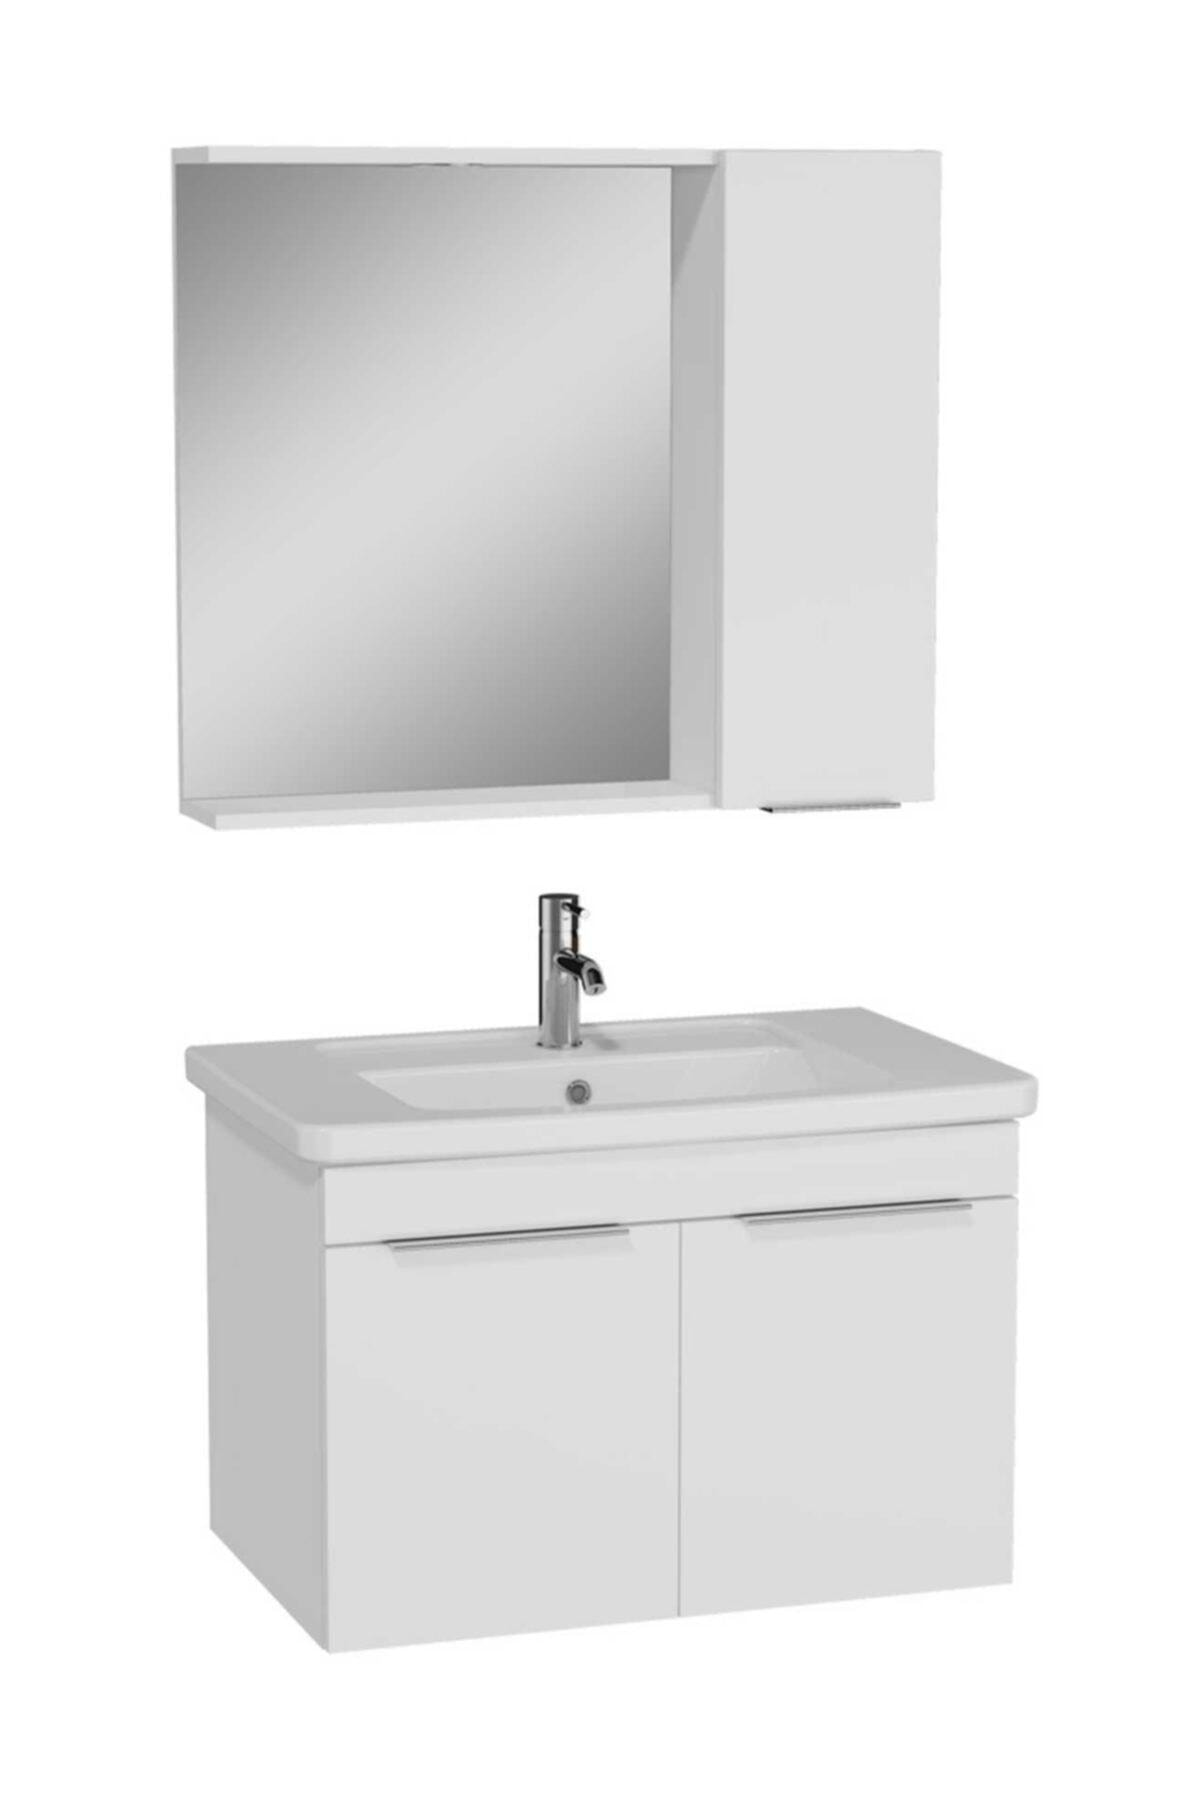 Quadrum Banyo Dolabı Seti Kapaklı 80 Cm Beyaz